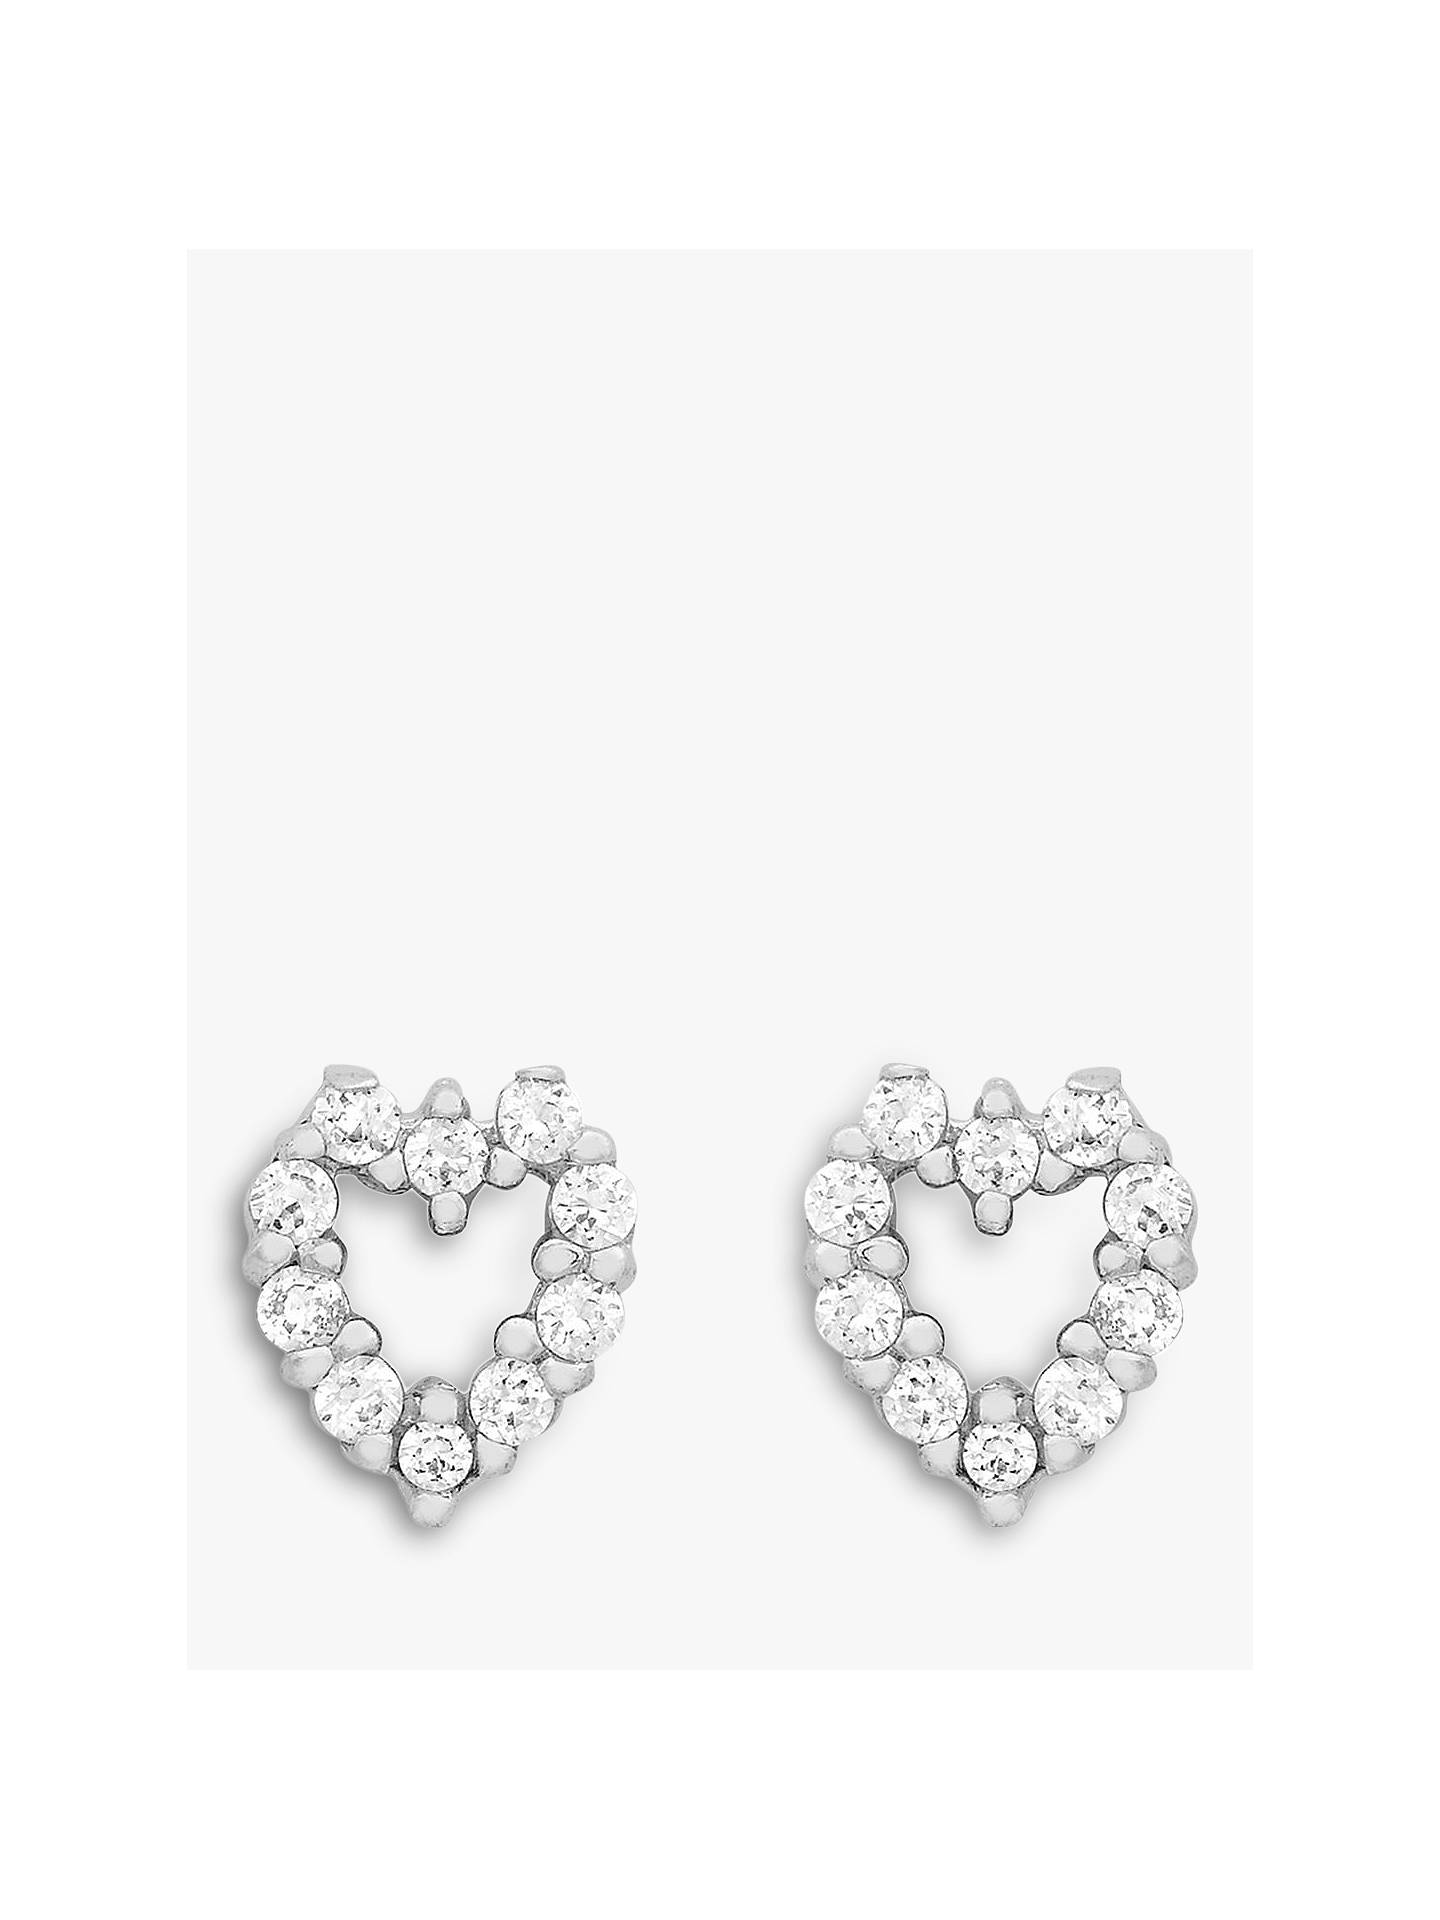 7b7db11dd Buy IBB 9ct White Gold Small Heart Stud Earrings, White Gold Online at  johnlewis.